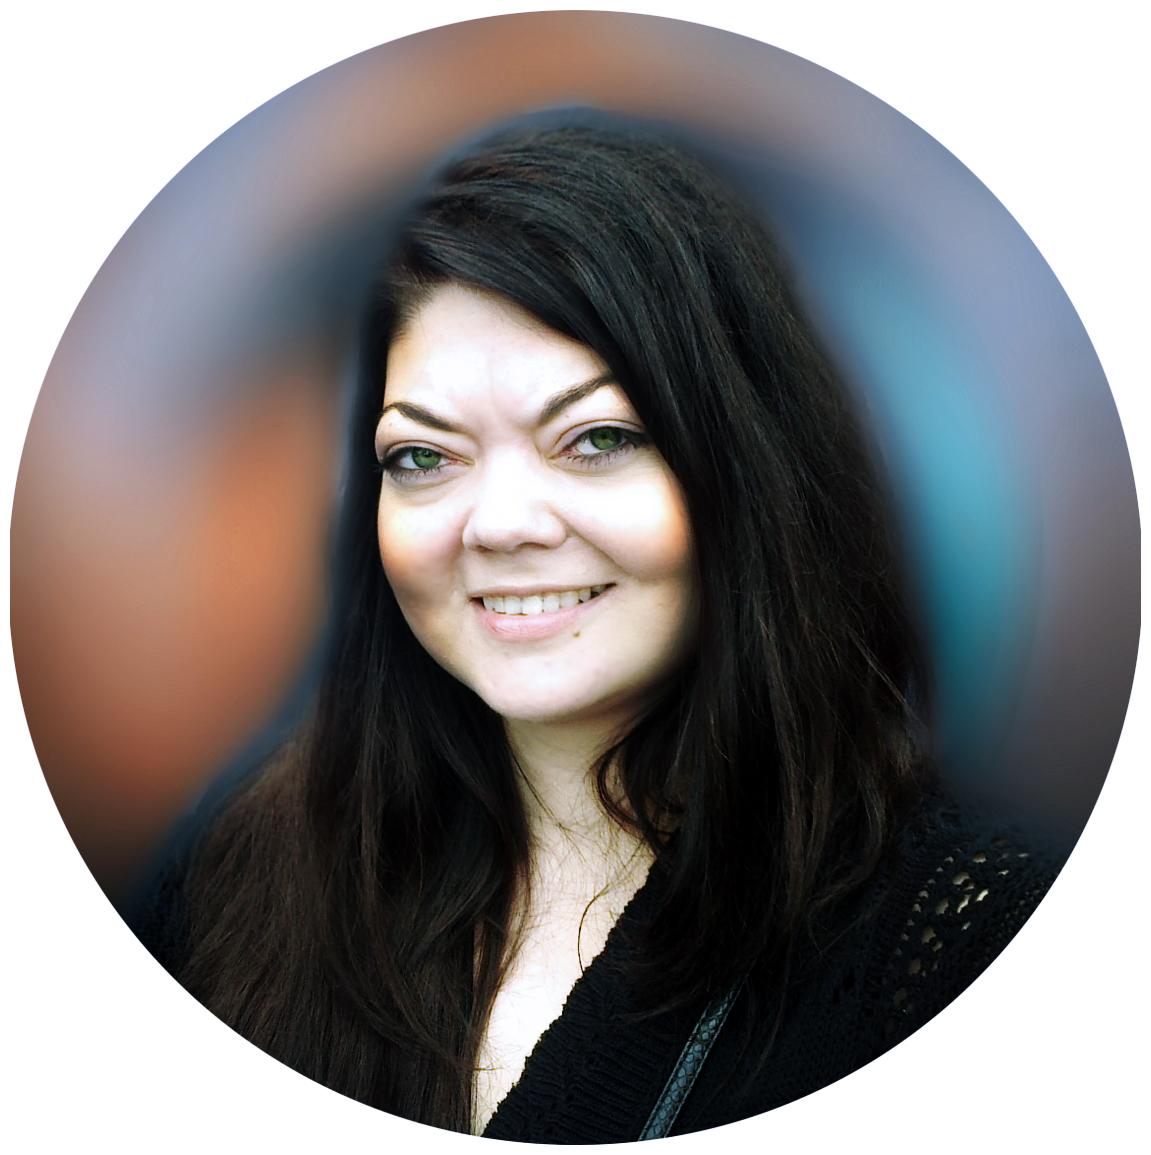 Helen Andriush_profile 02